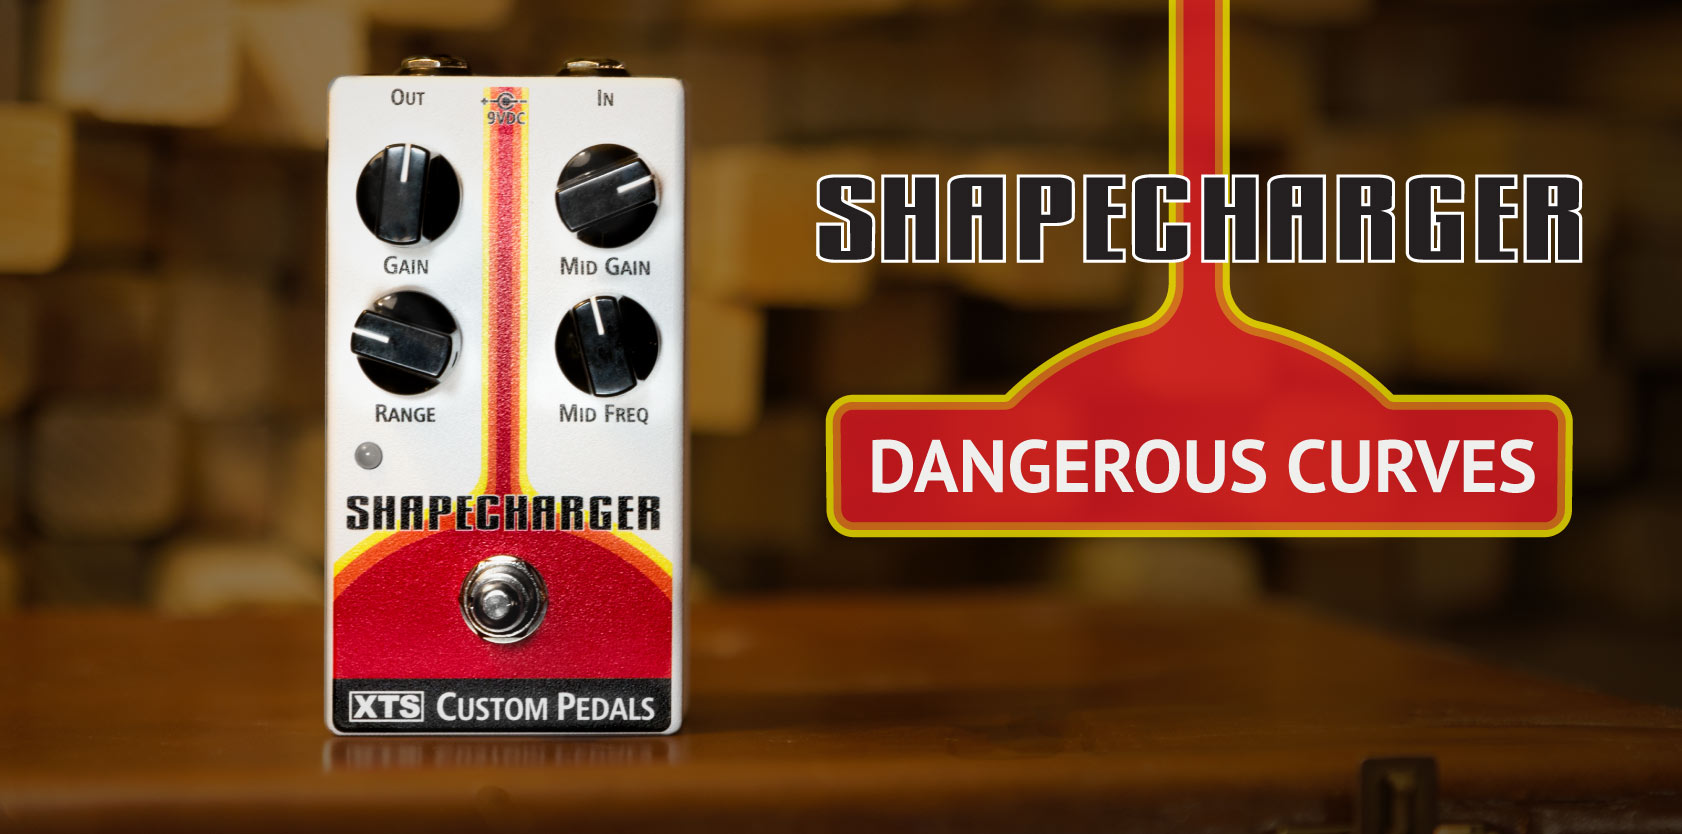 shape-charger.jpg